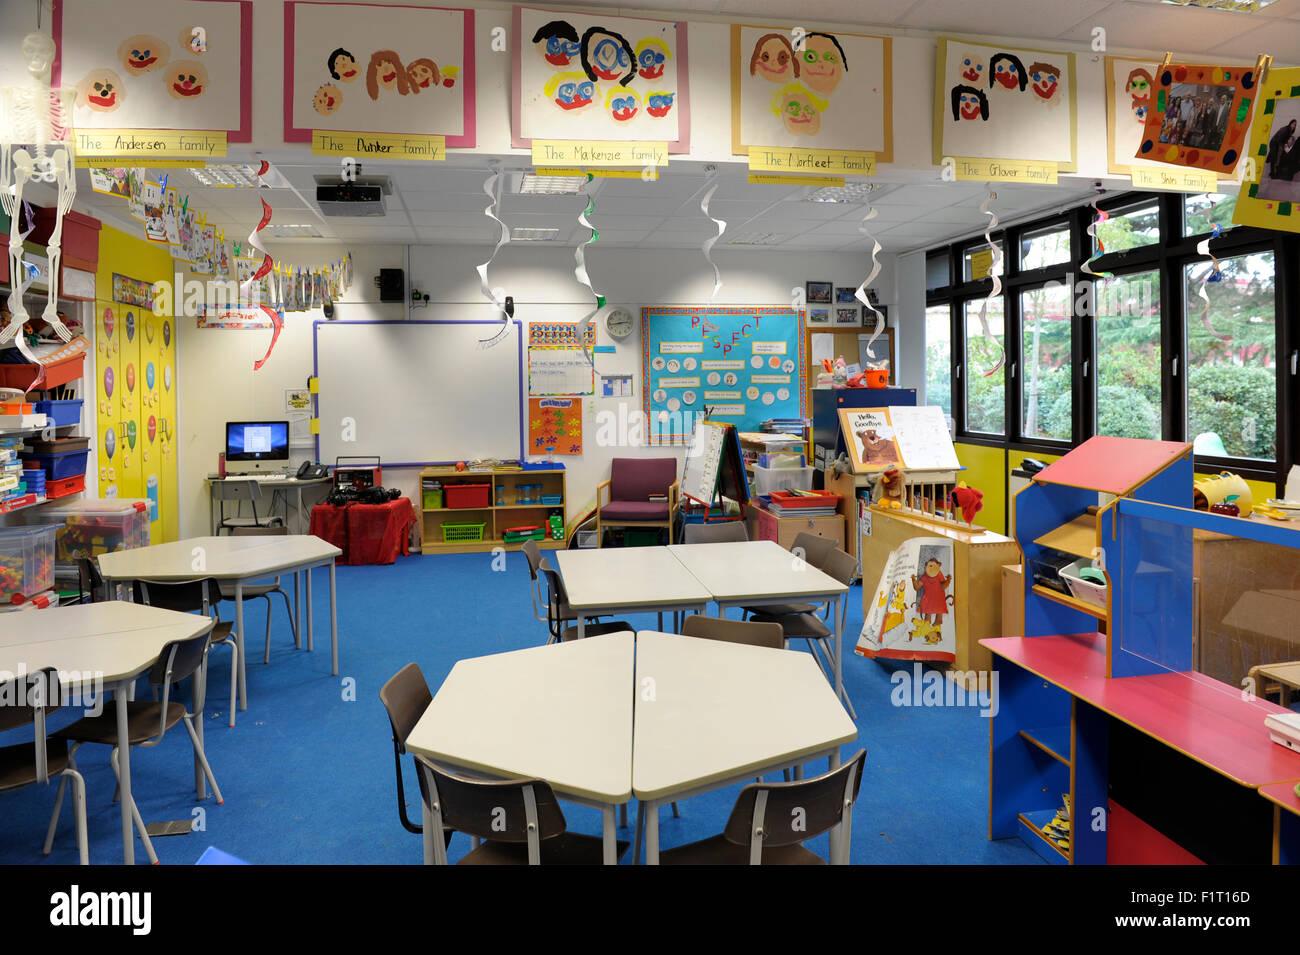 Empty Classroom And Desks Stockfotos & Empty Classroom And Desks ...